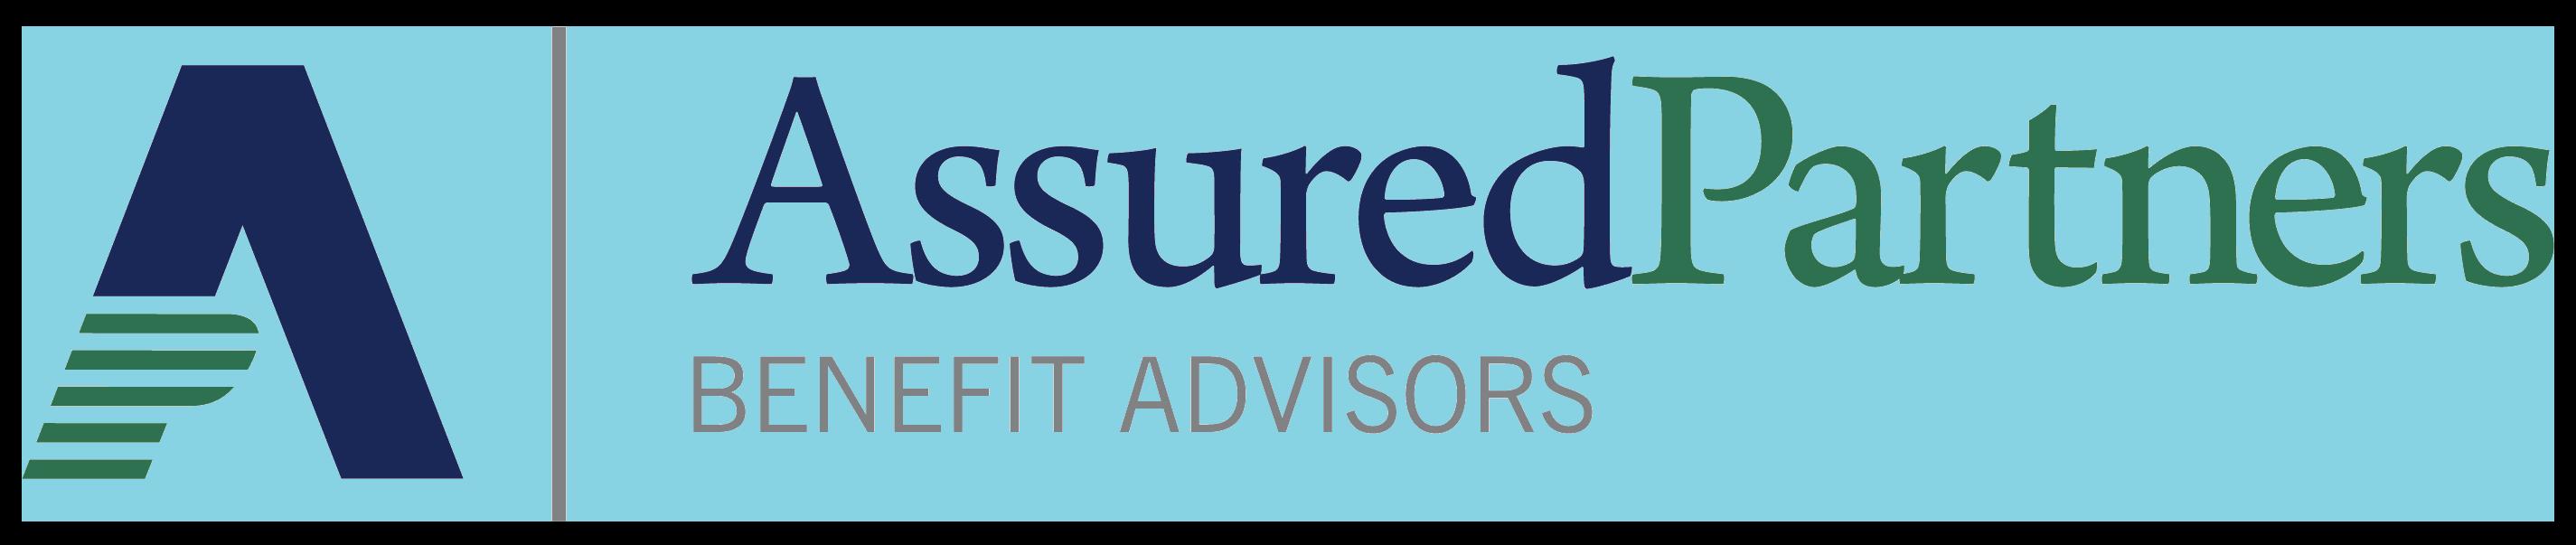 AP Benefit Advisors